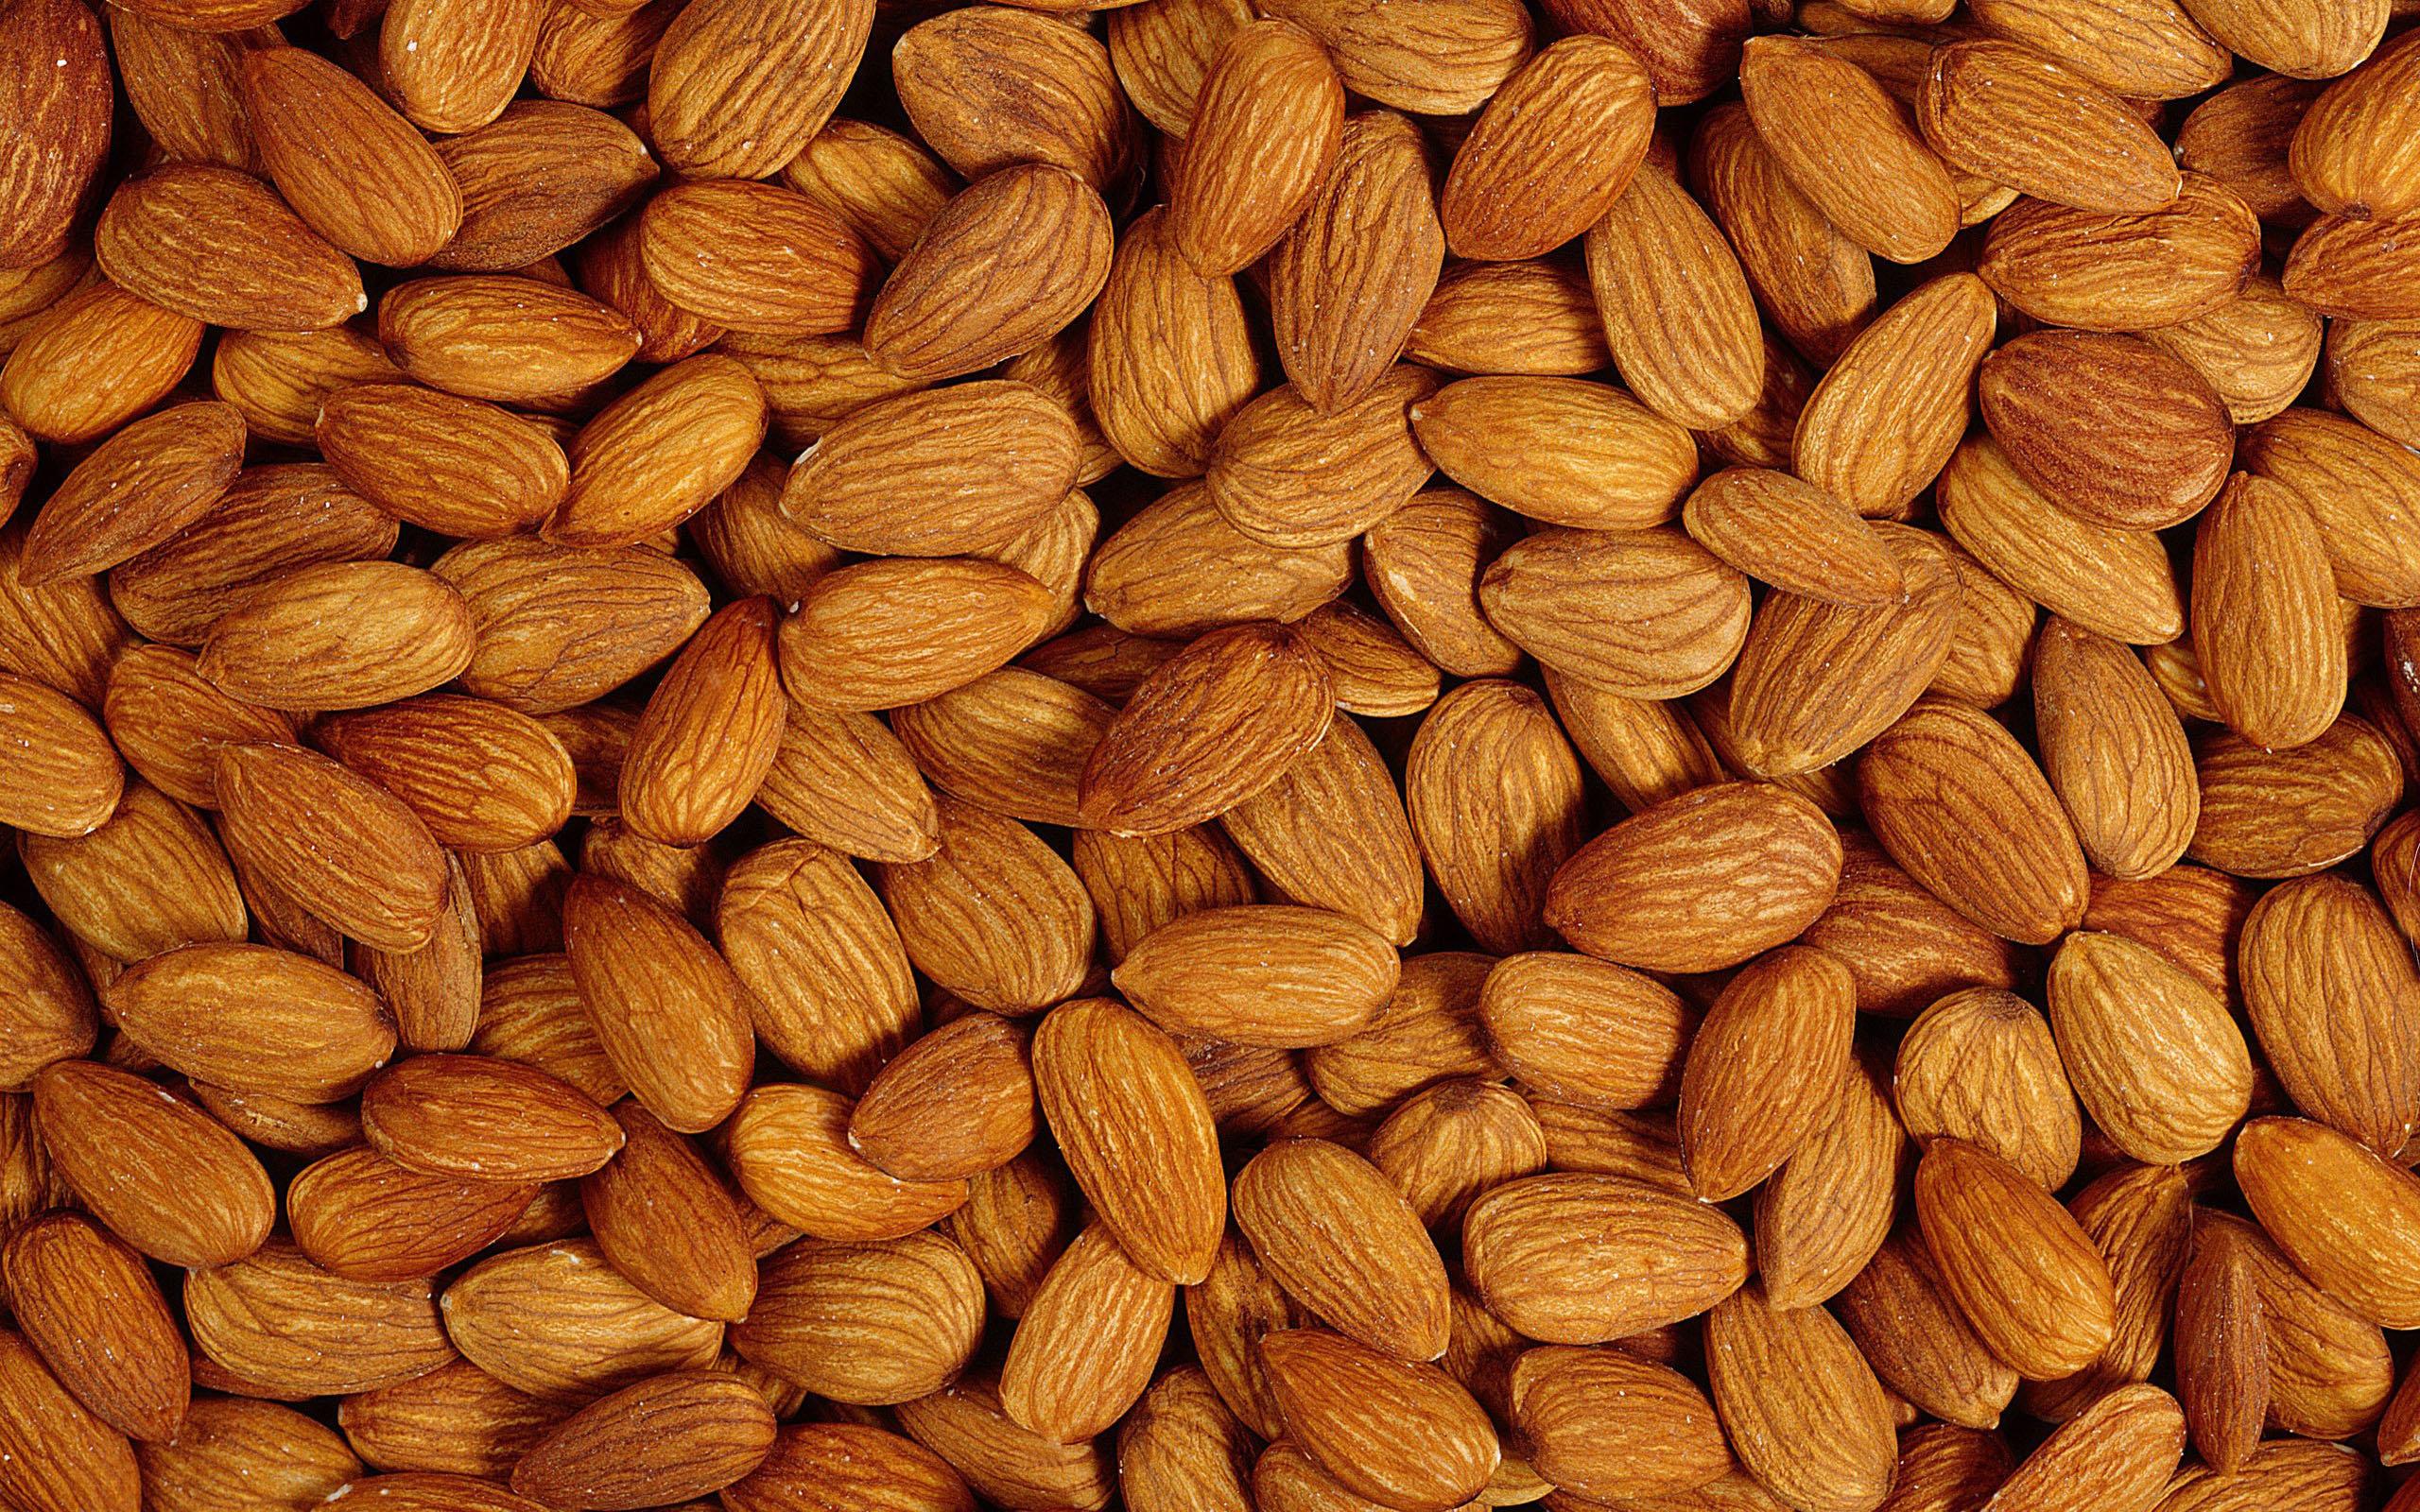 download hd 2560x1600 almond desktop wallpaper id:456084 for free